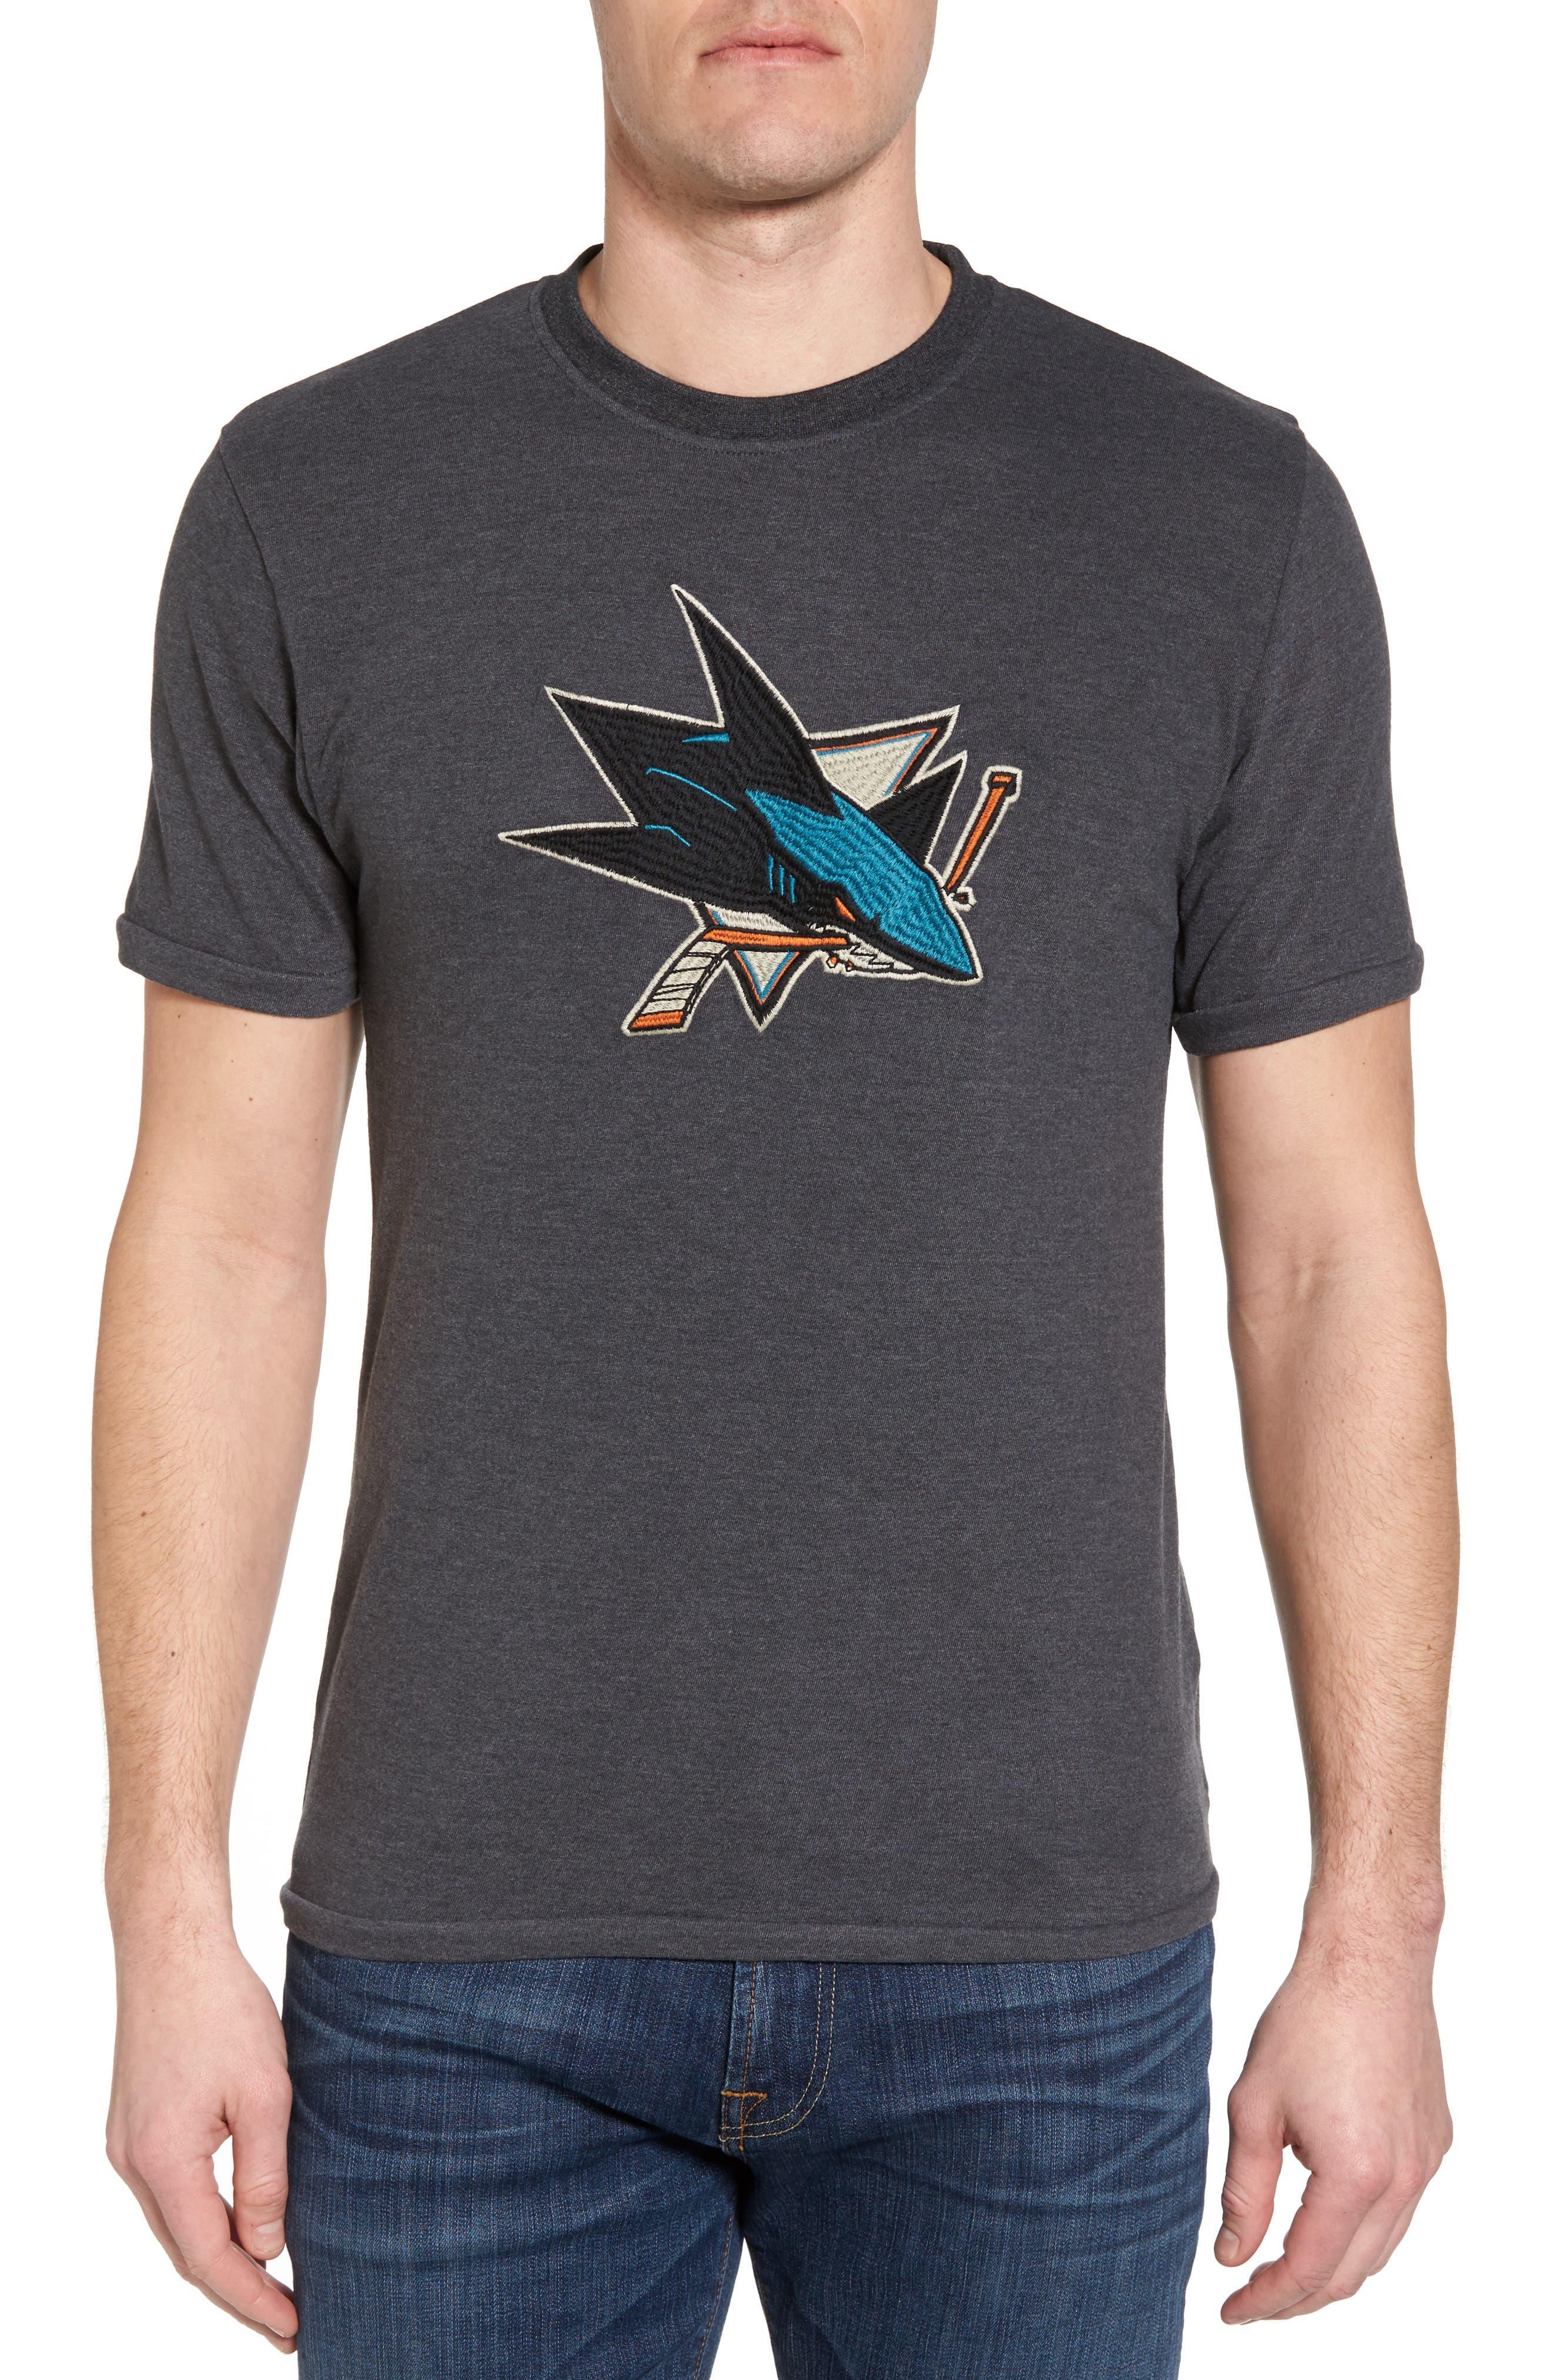 American Needle Hillwood San José Sharks Embroidered T-Shirt